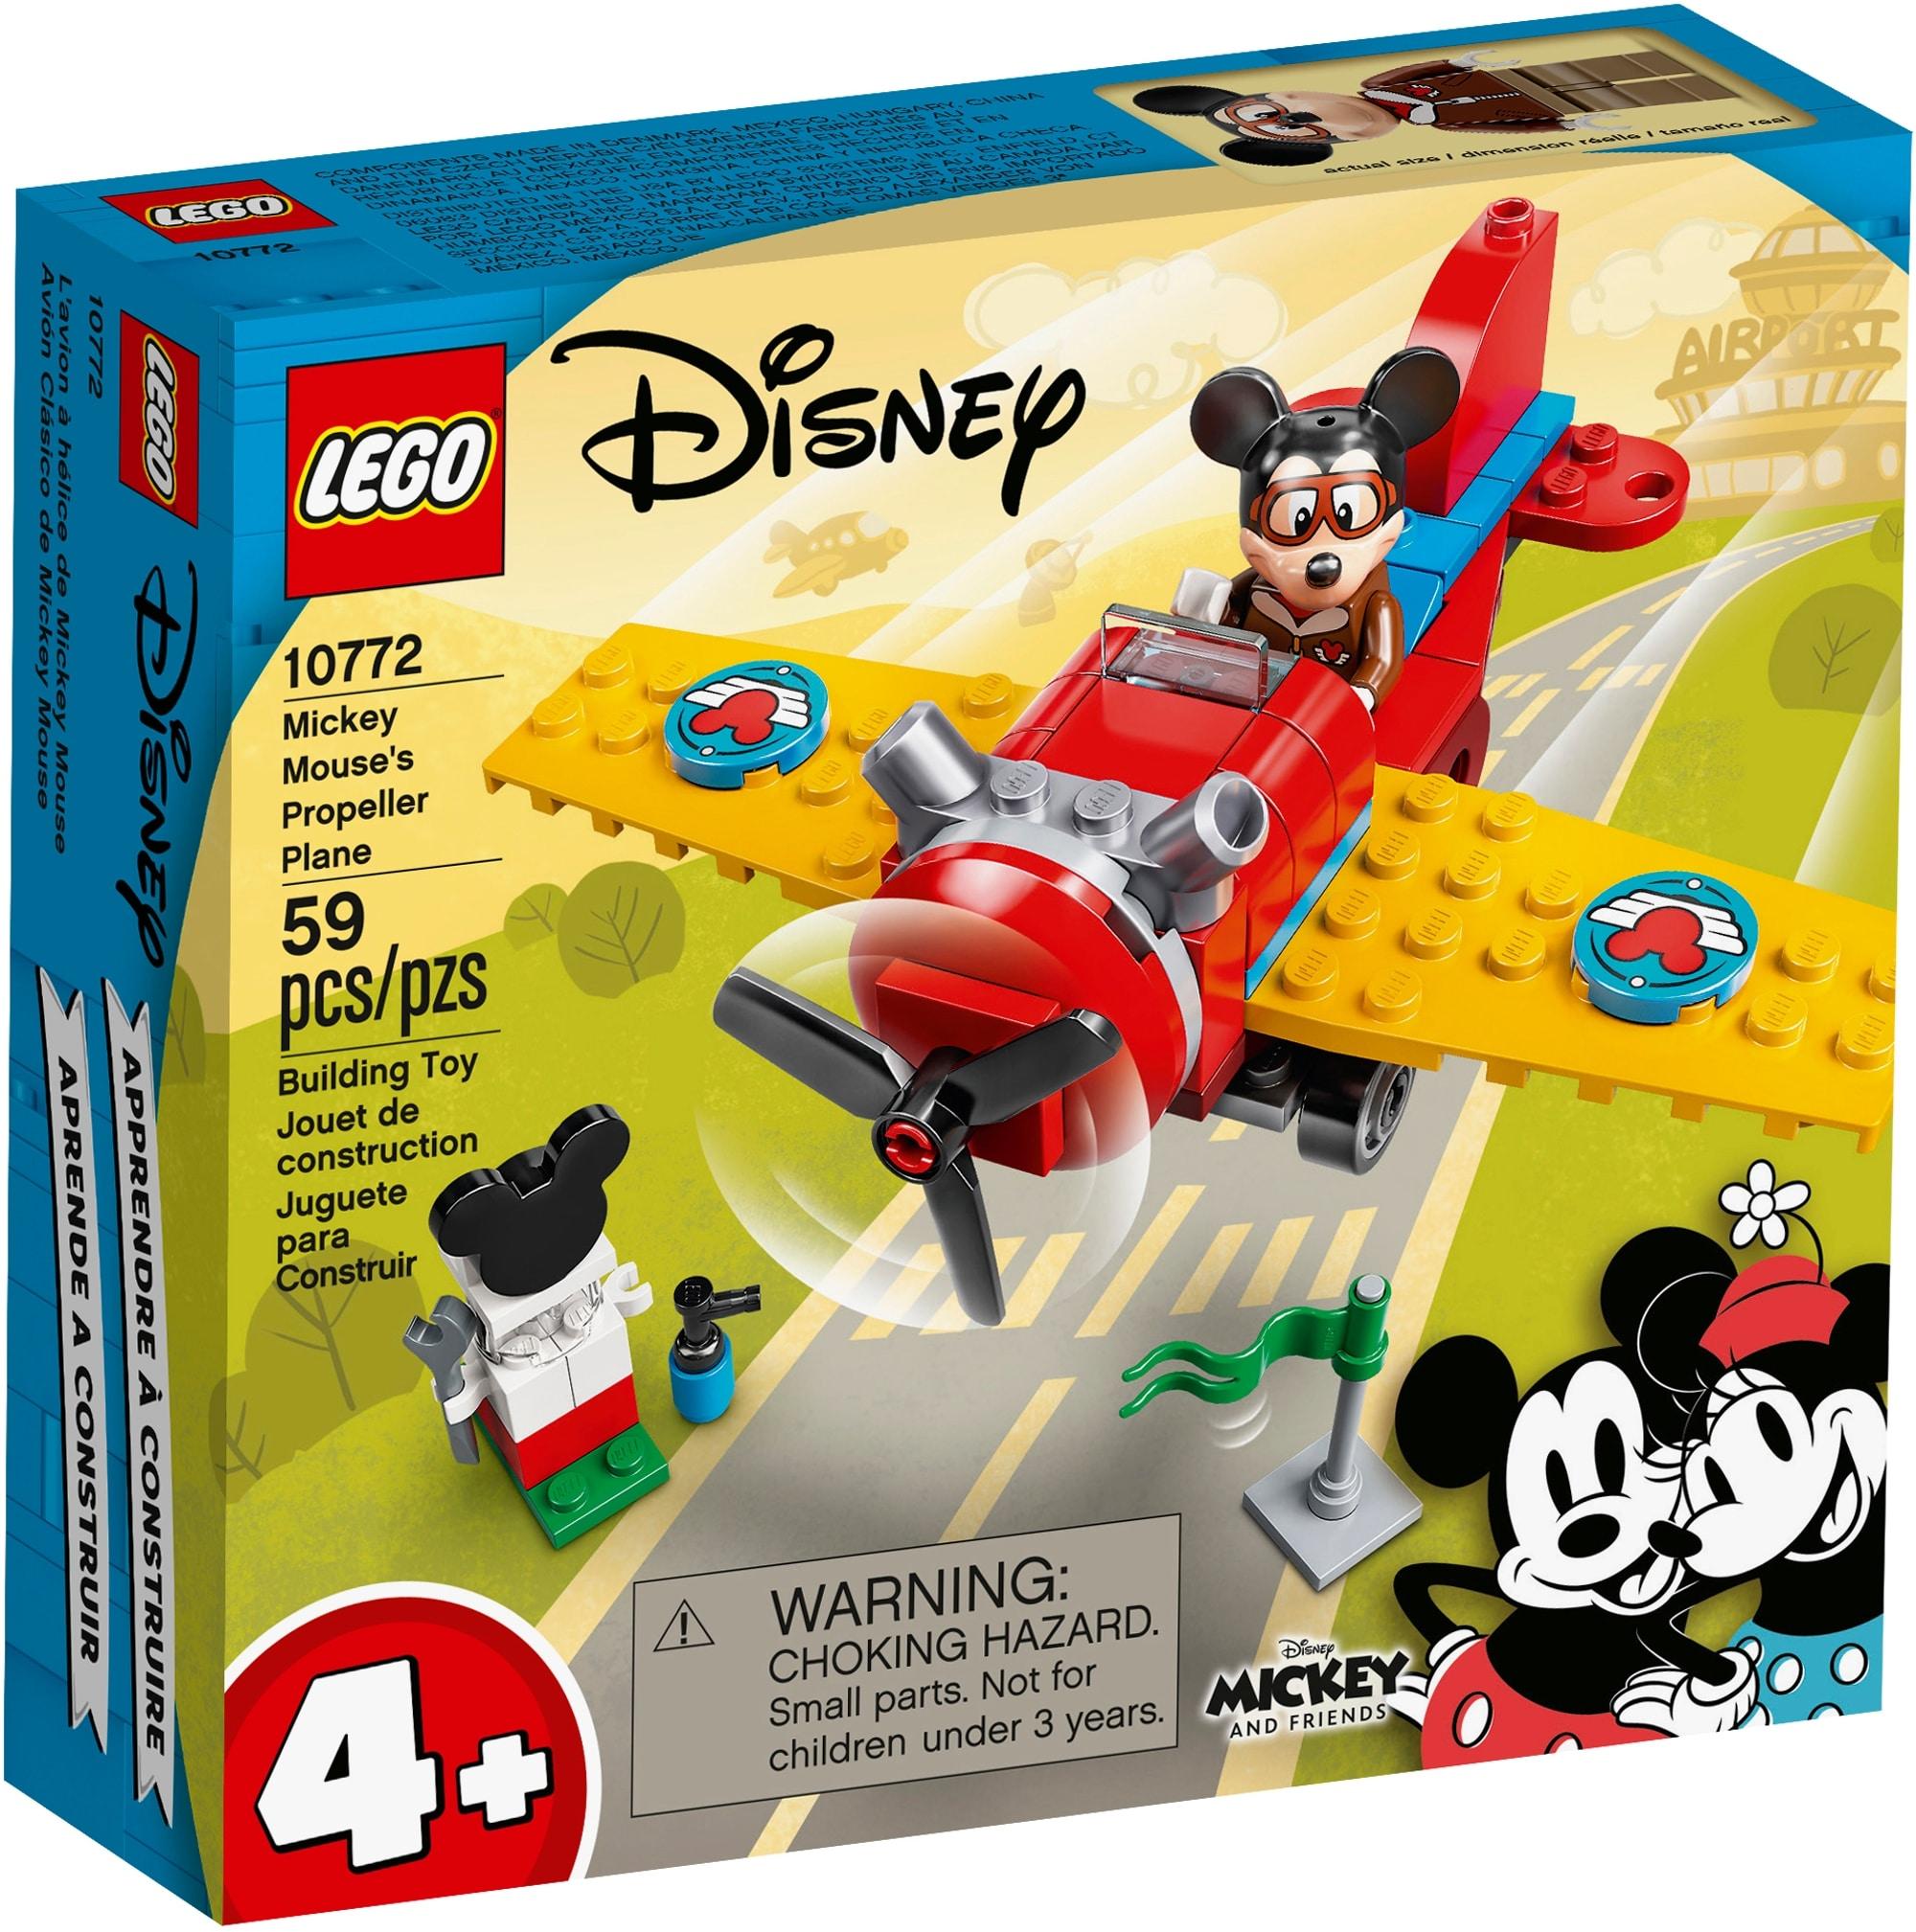 LEGO Disney 10772 Mickys Propellerflugzeug 2